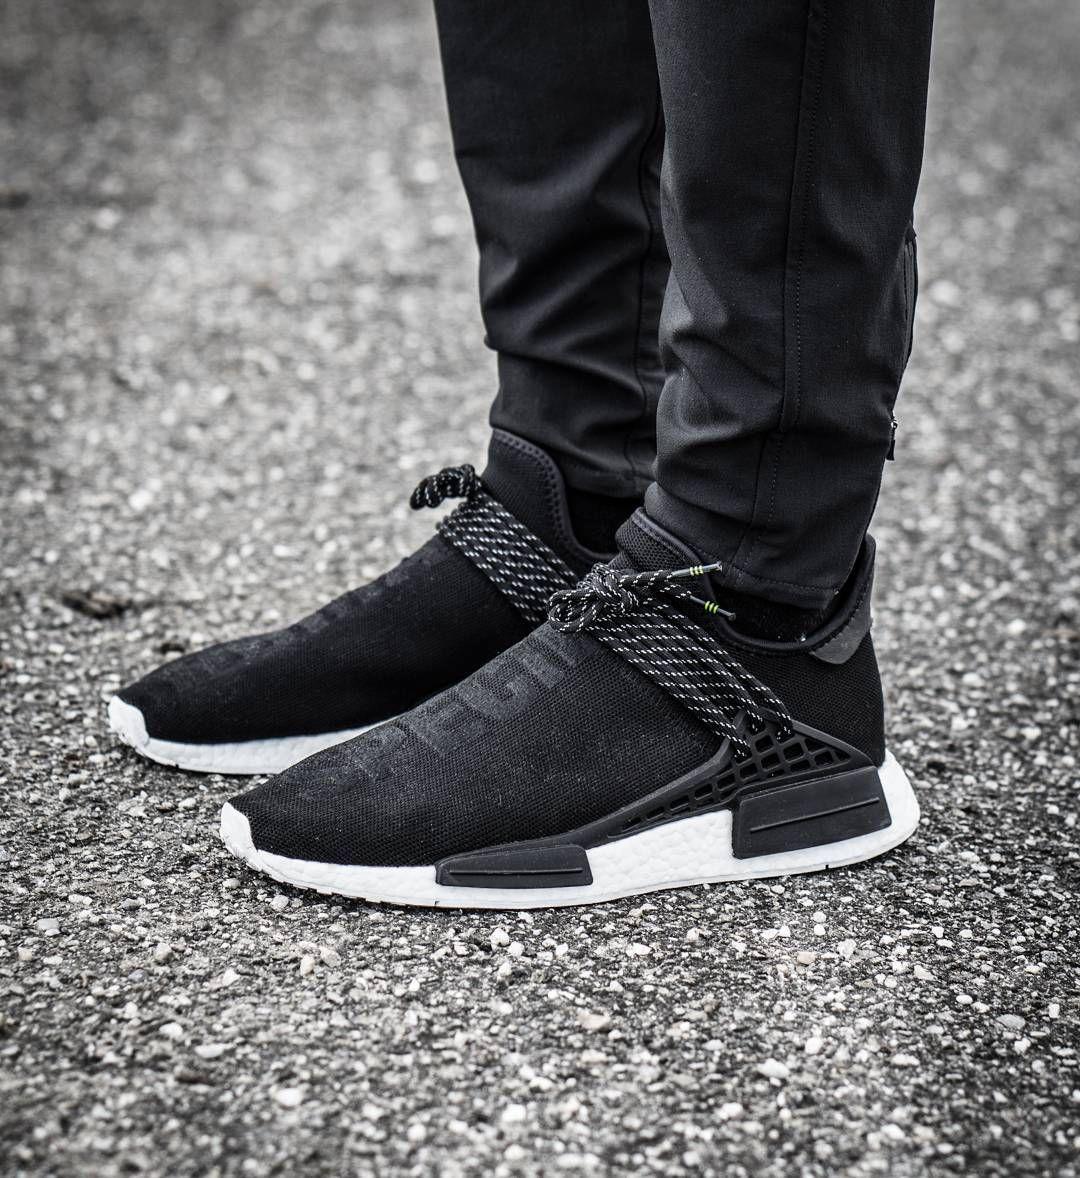 coupon code buy popular great look 3,011 Likes, 95 Comments - Sneakers & Streetwear (@shoebertt) on ...